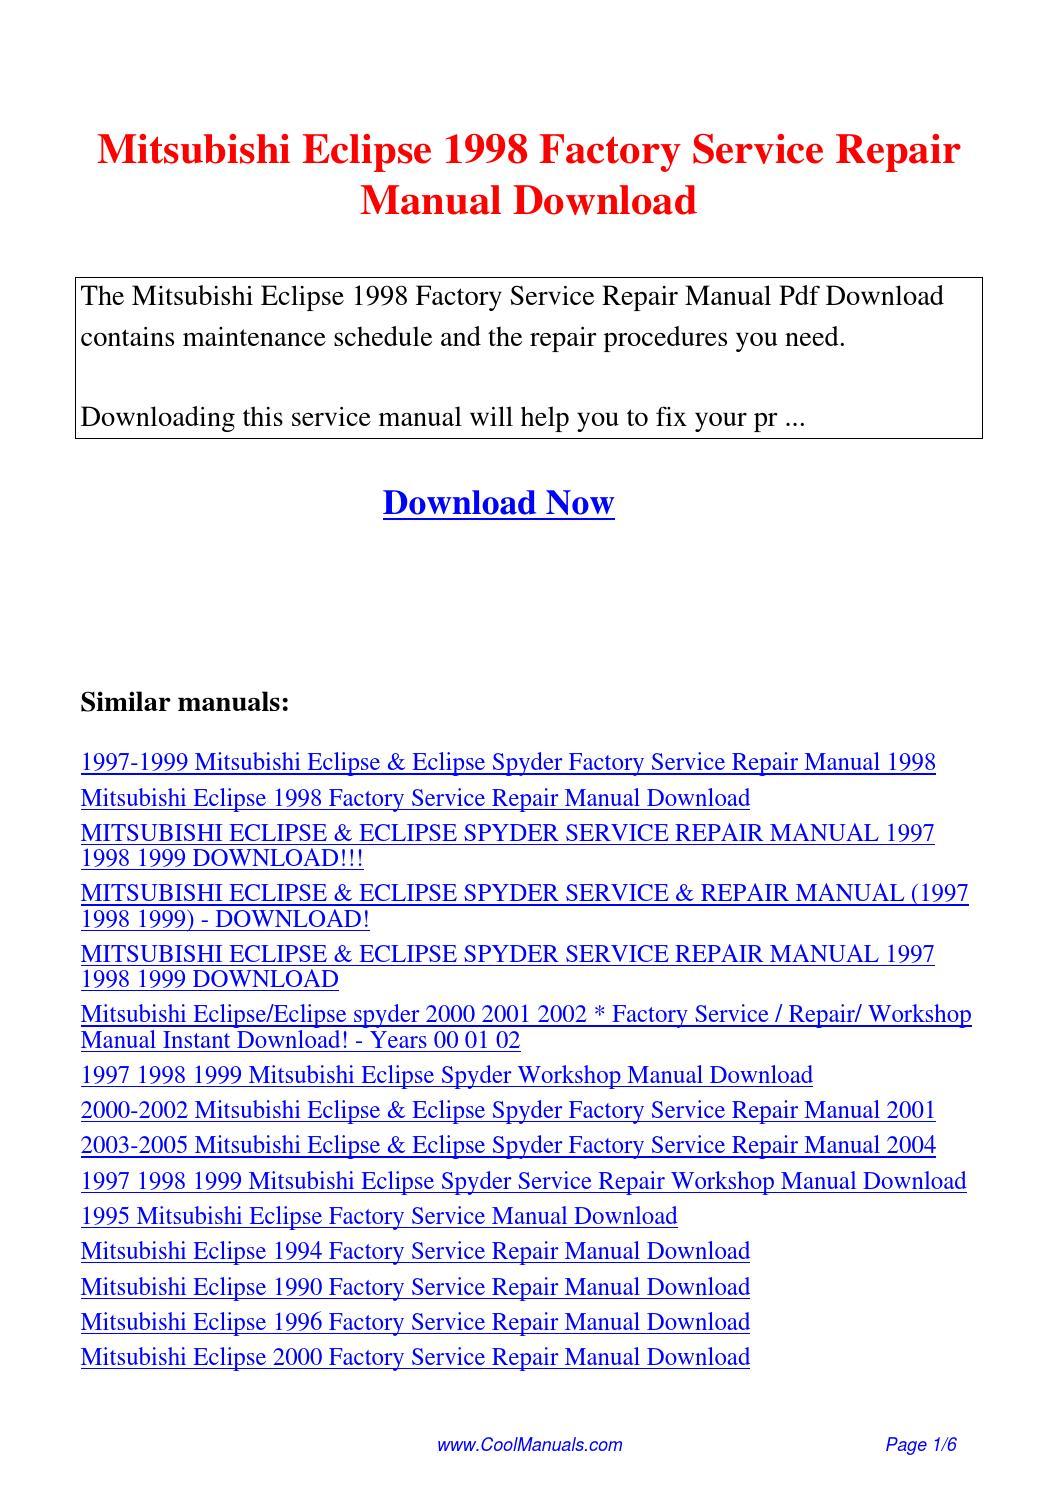 twilight eclipse pdf ebook free download